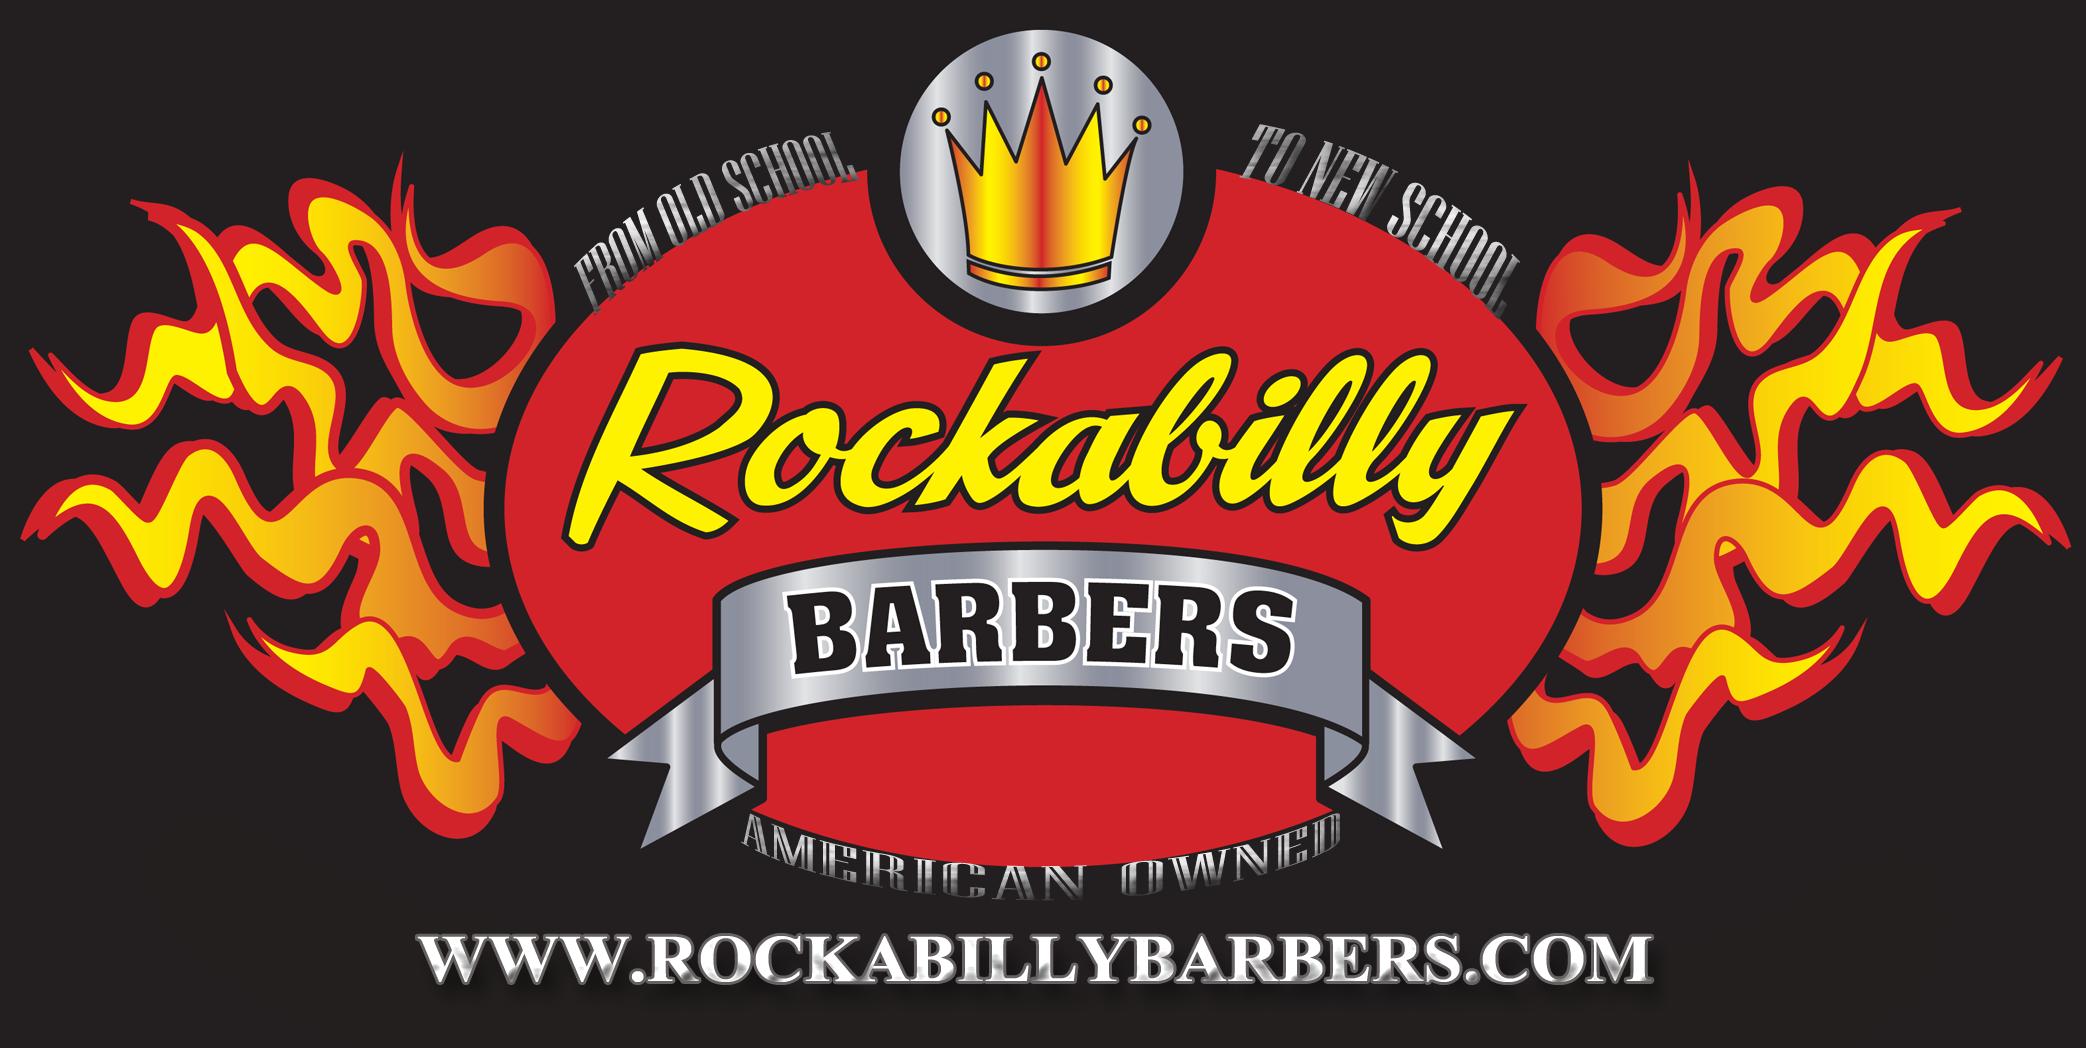 Rockabilly Barbers